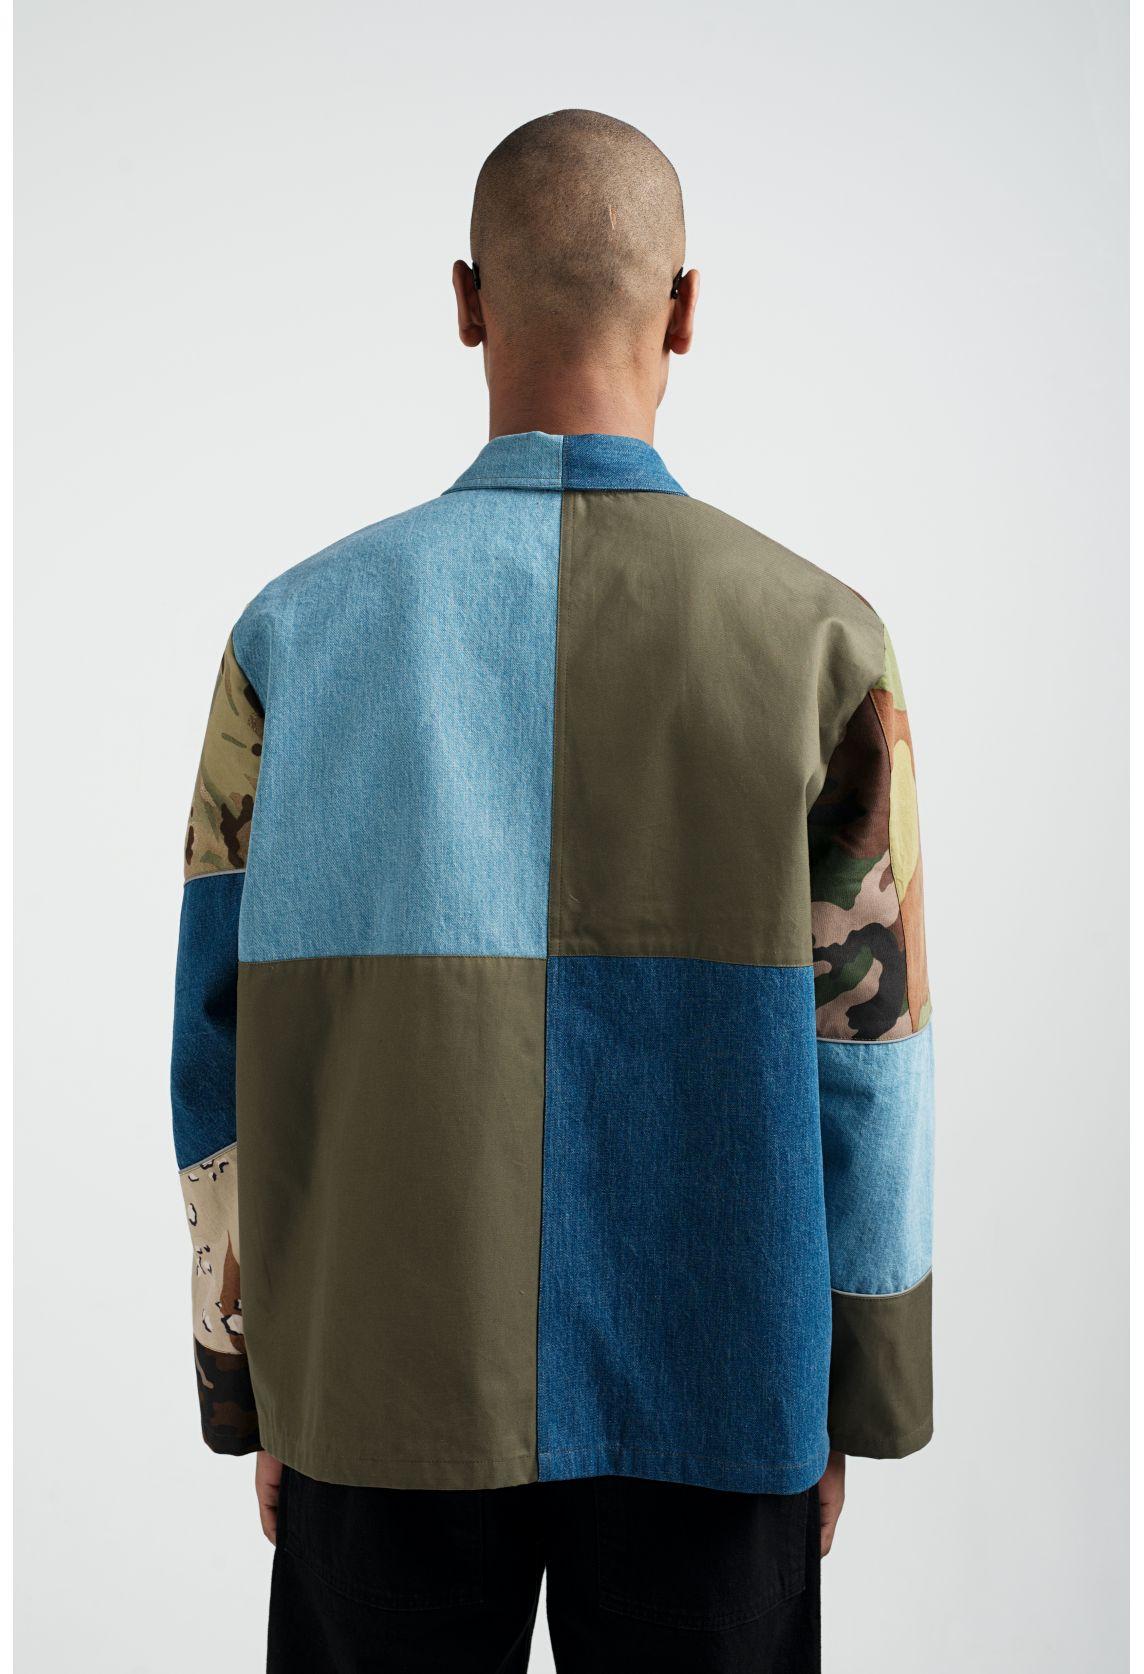 Reworked Worked Jacket